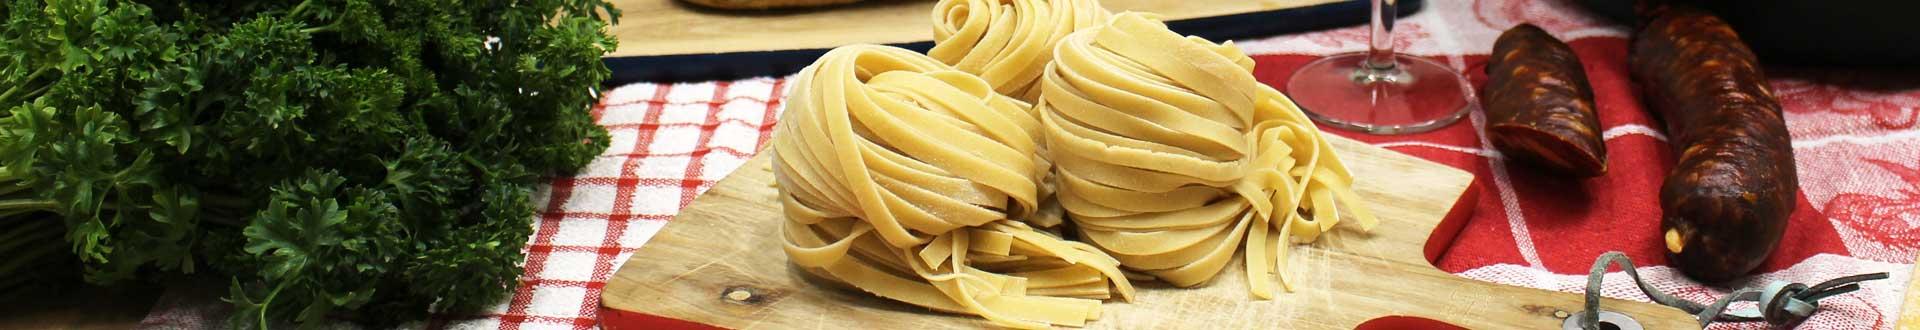 fresh-frozen-pasta-fettuccini